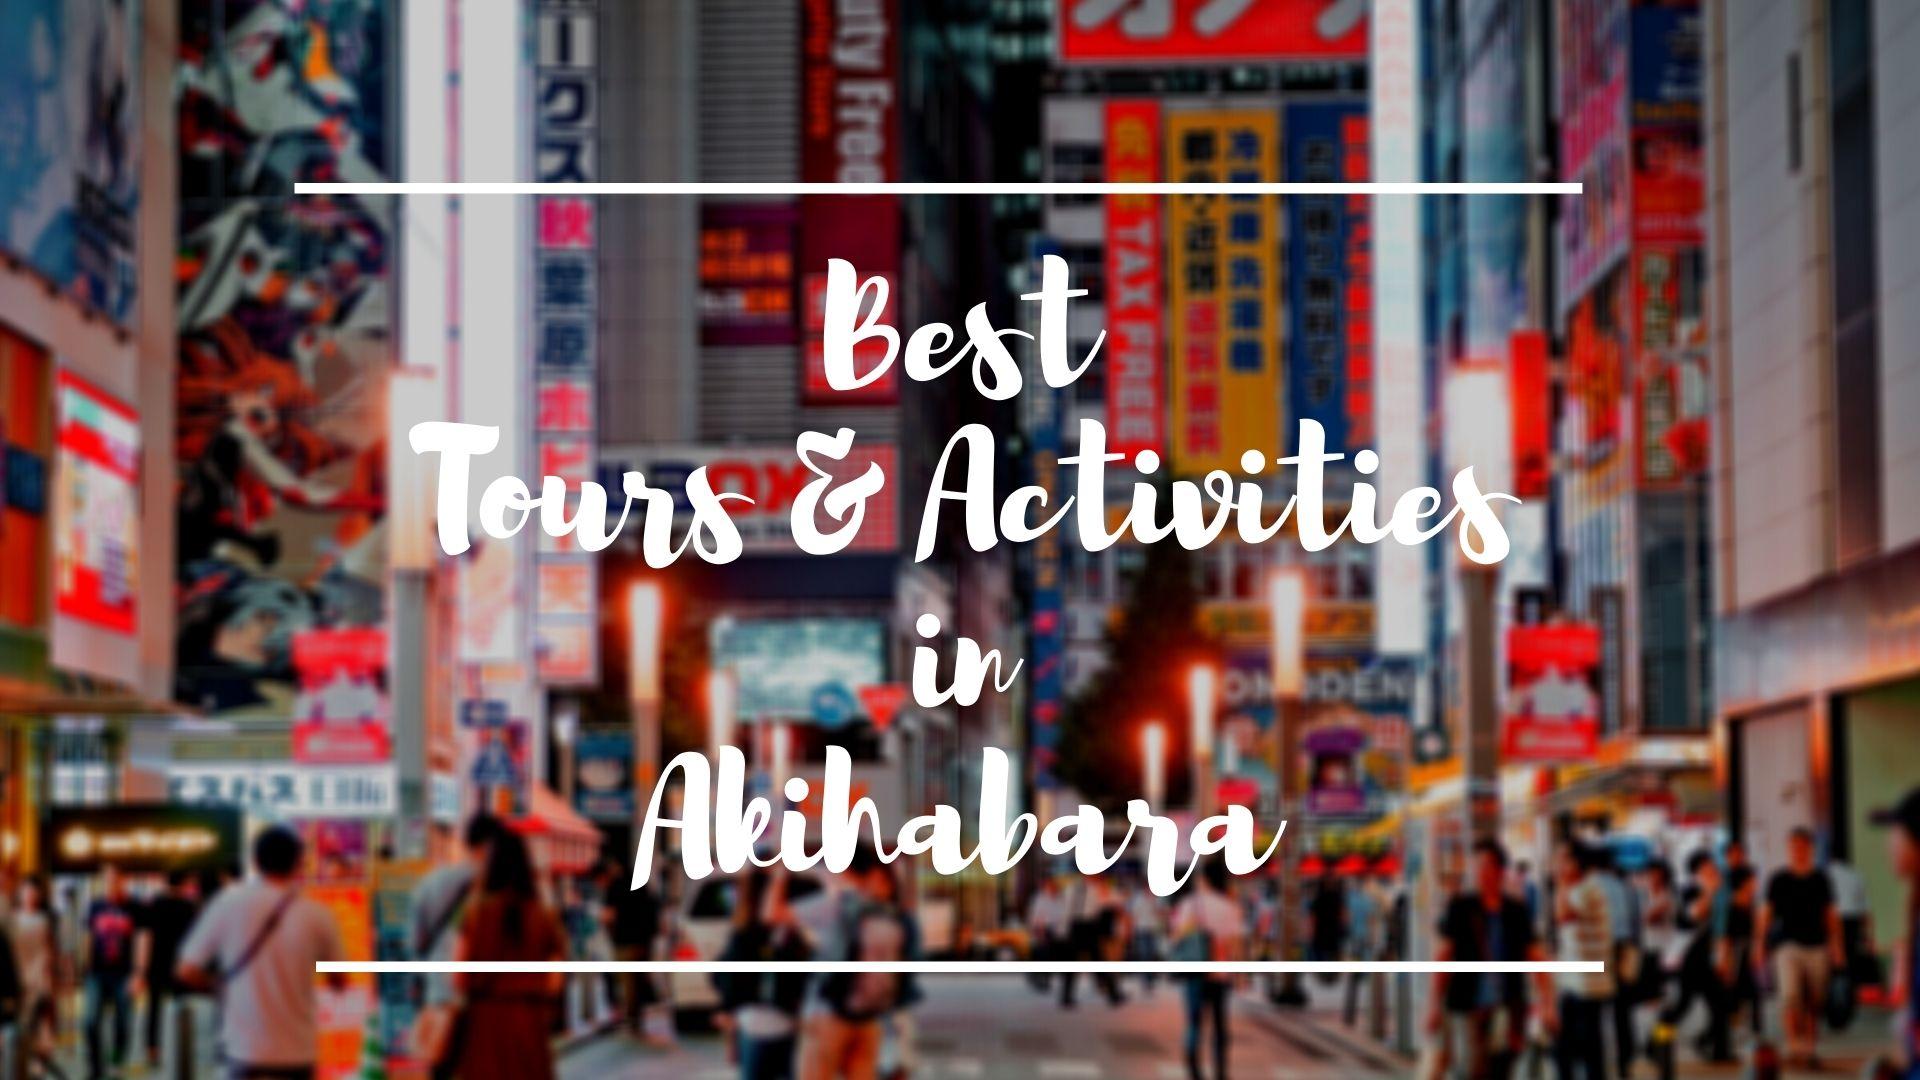 Akihabara : Best Tours and Activities 2021